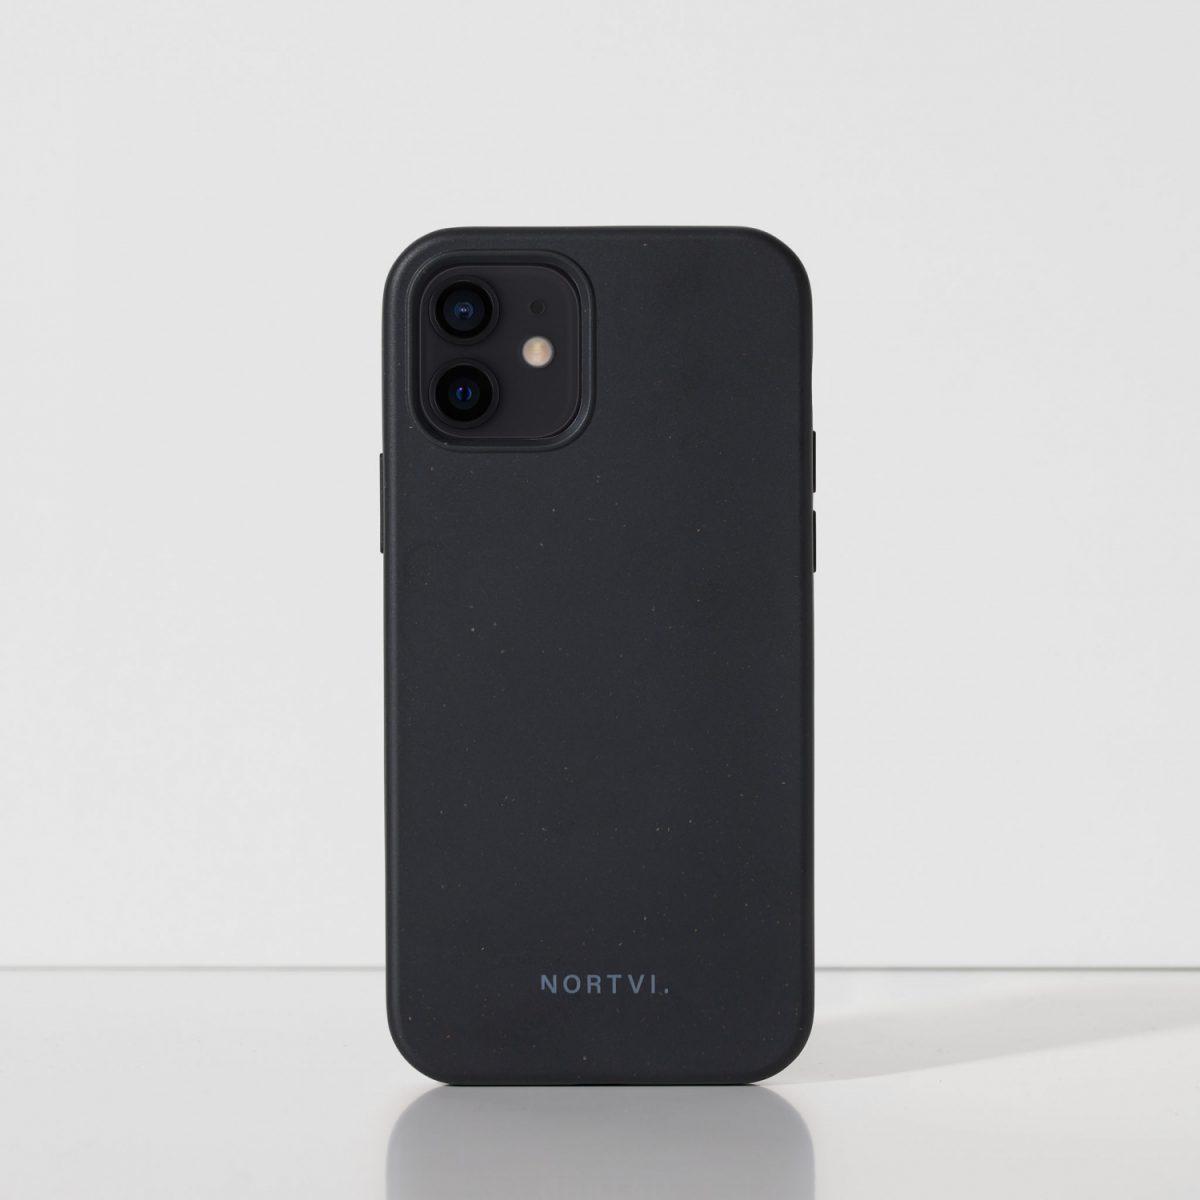 NORTVI black phone case for iPhone 12 case